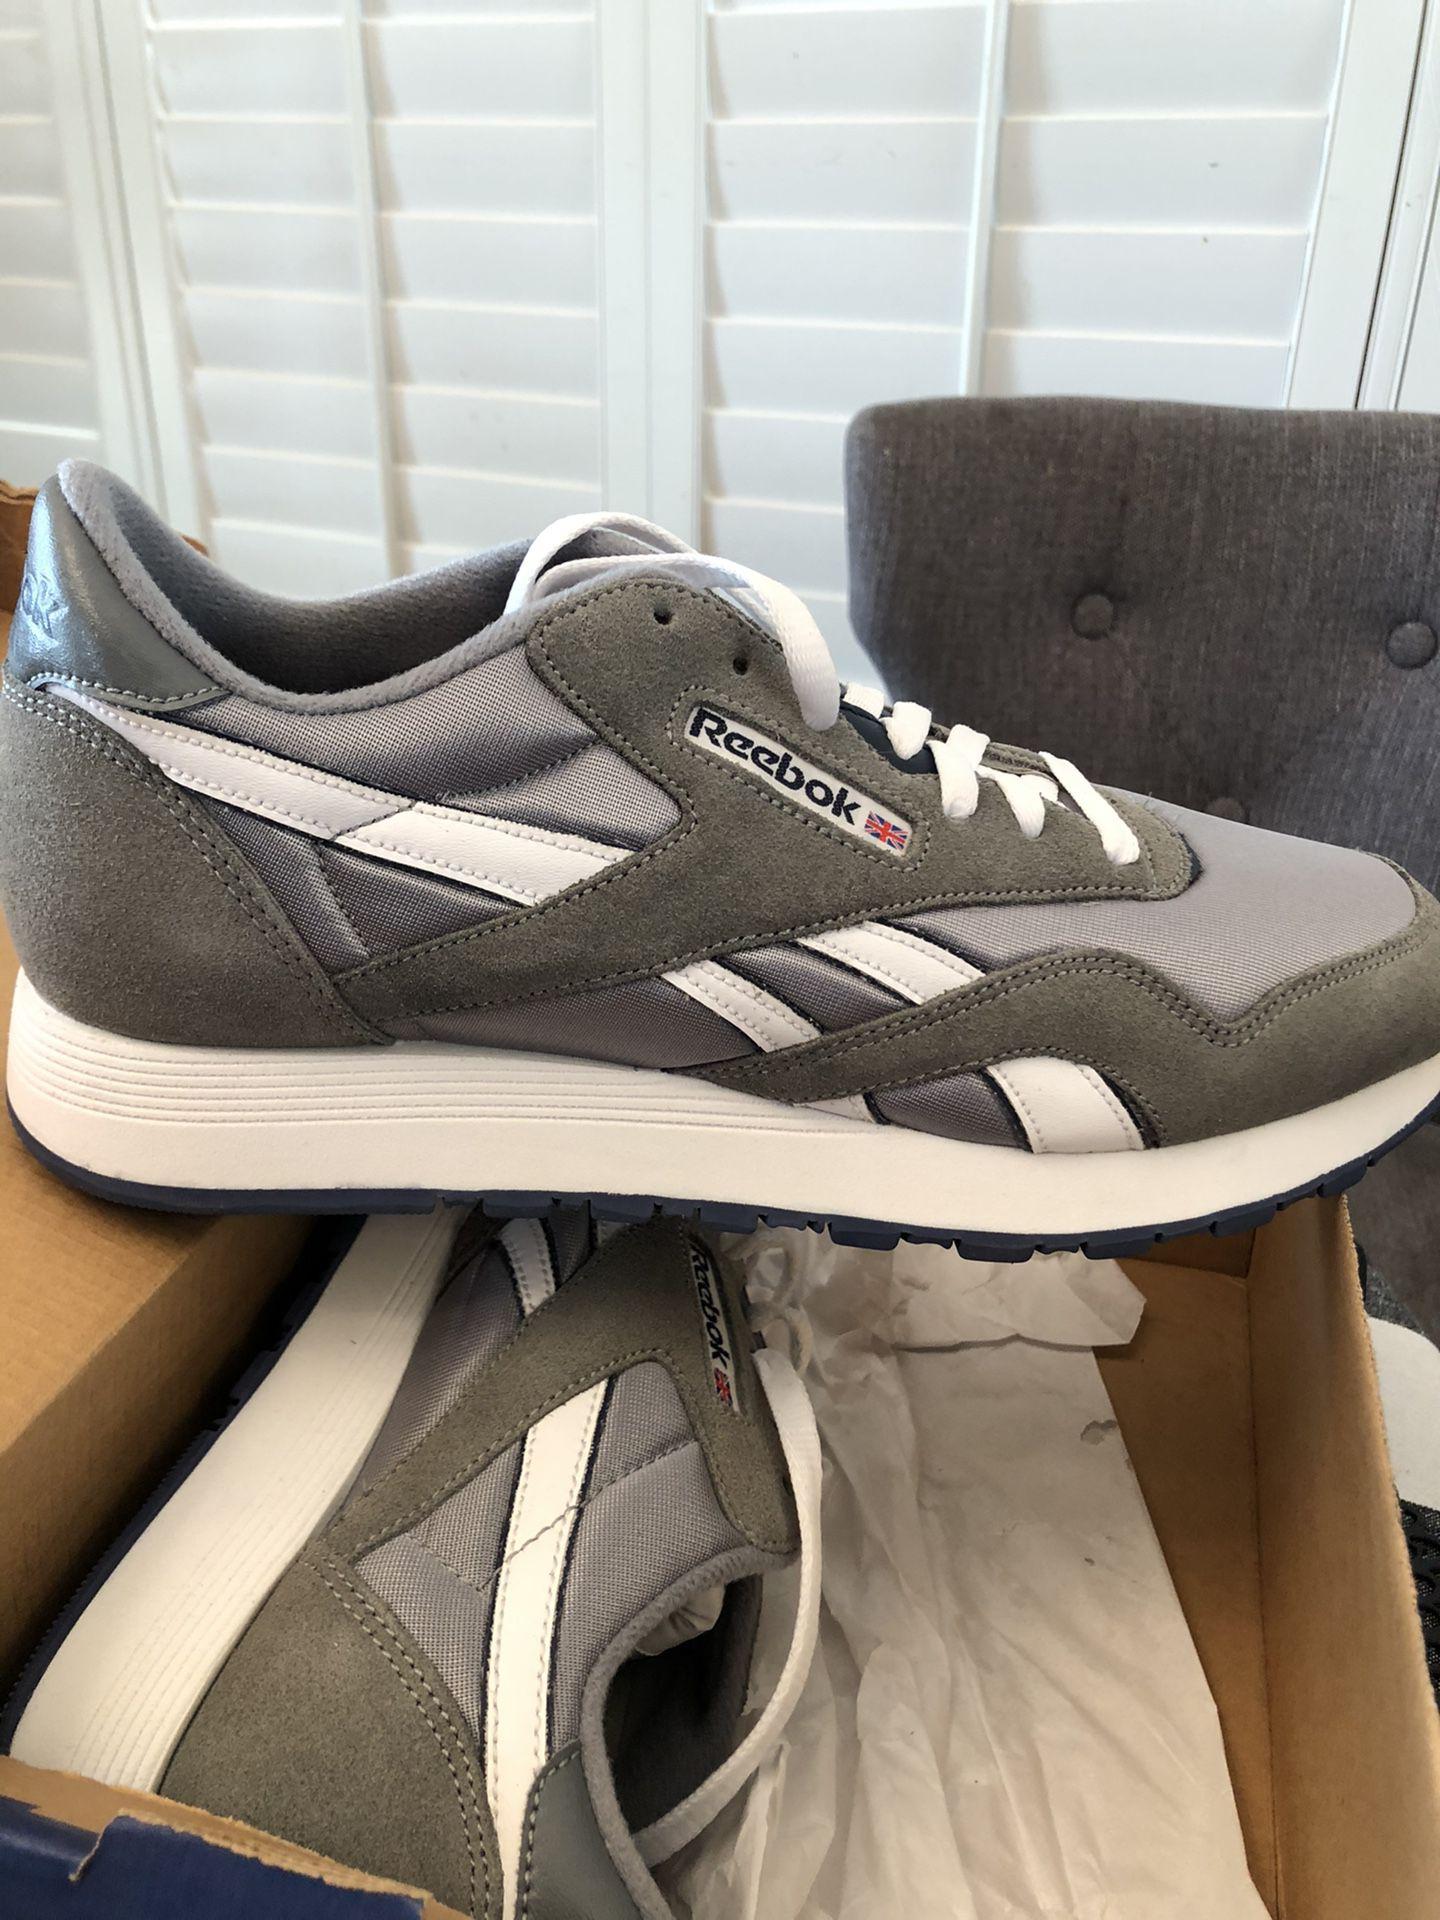 Reebok Classic Men's Shoes Size 10.5 NEW